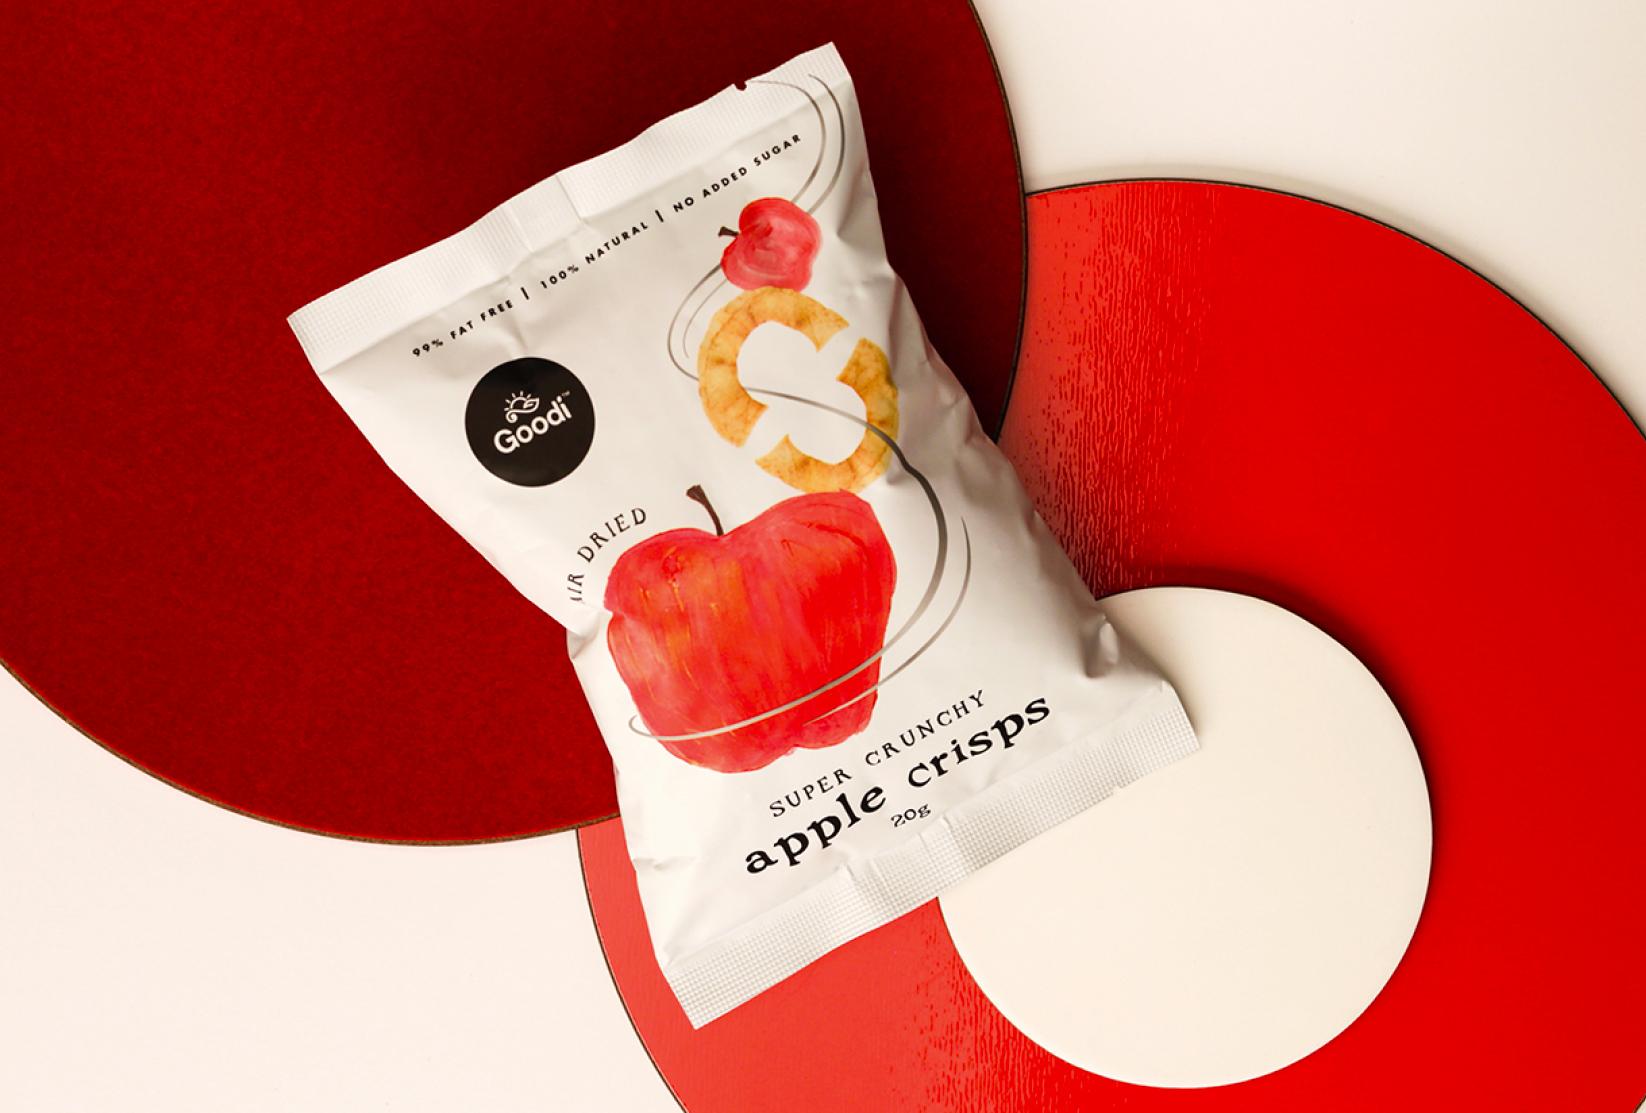 Goodi Apple Crisps